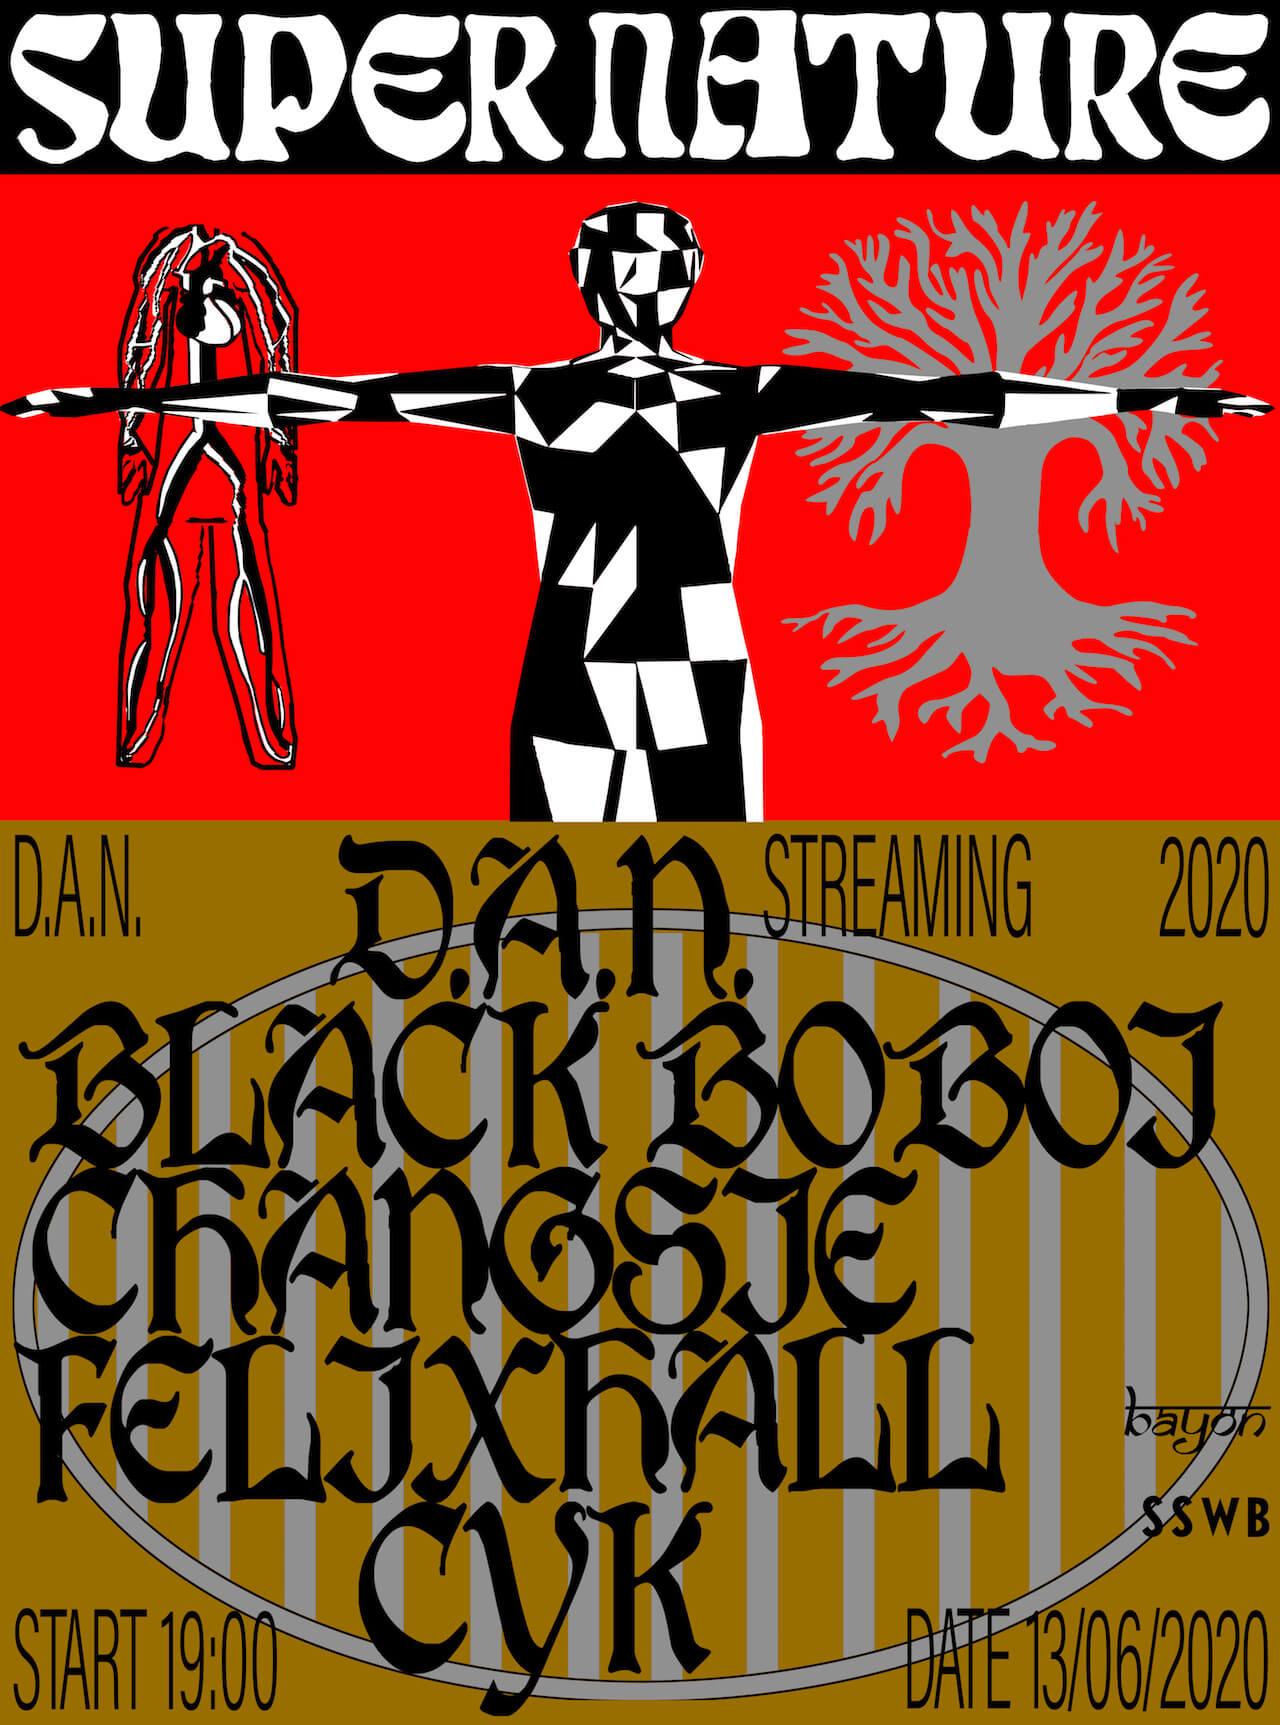 D.A.N.主催の配信イベント企画<Supernature>に追加アクトとしてCYK+VJ kechanが出演決定 music200524-dan-supernature-3